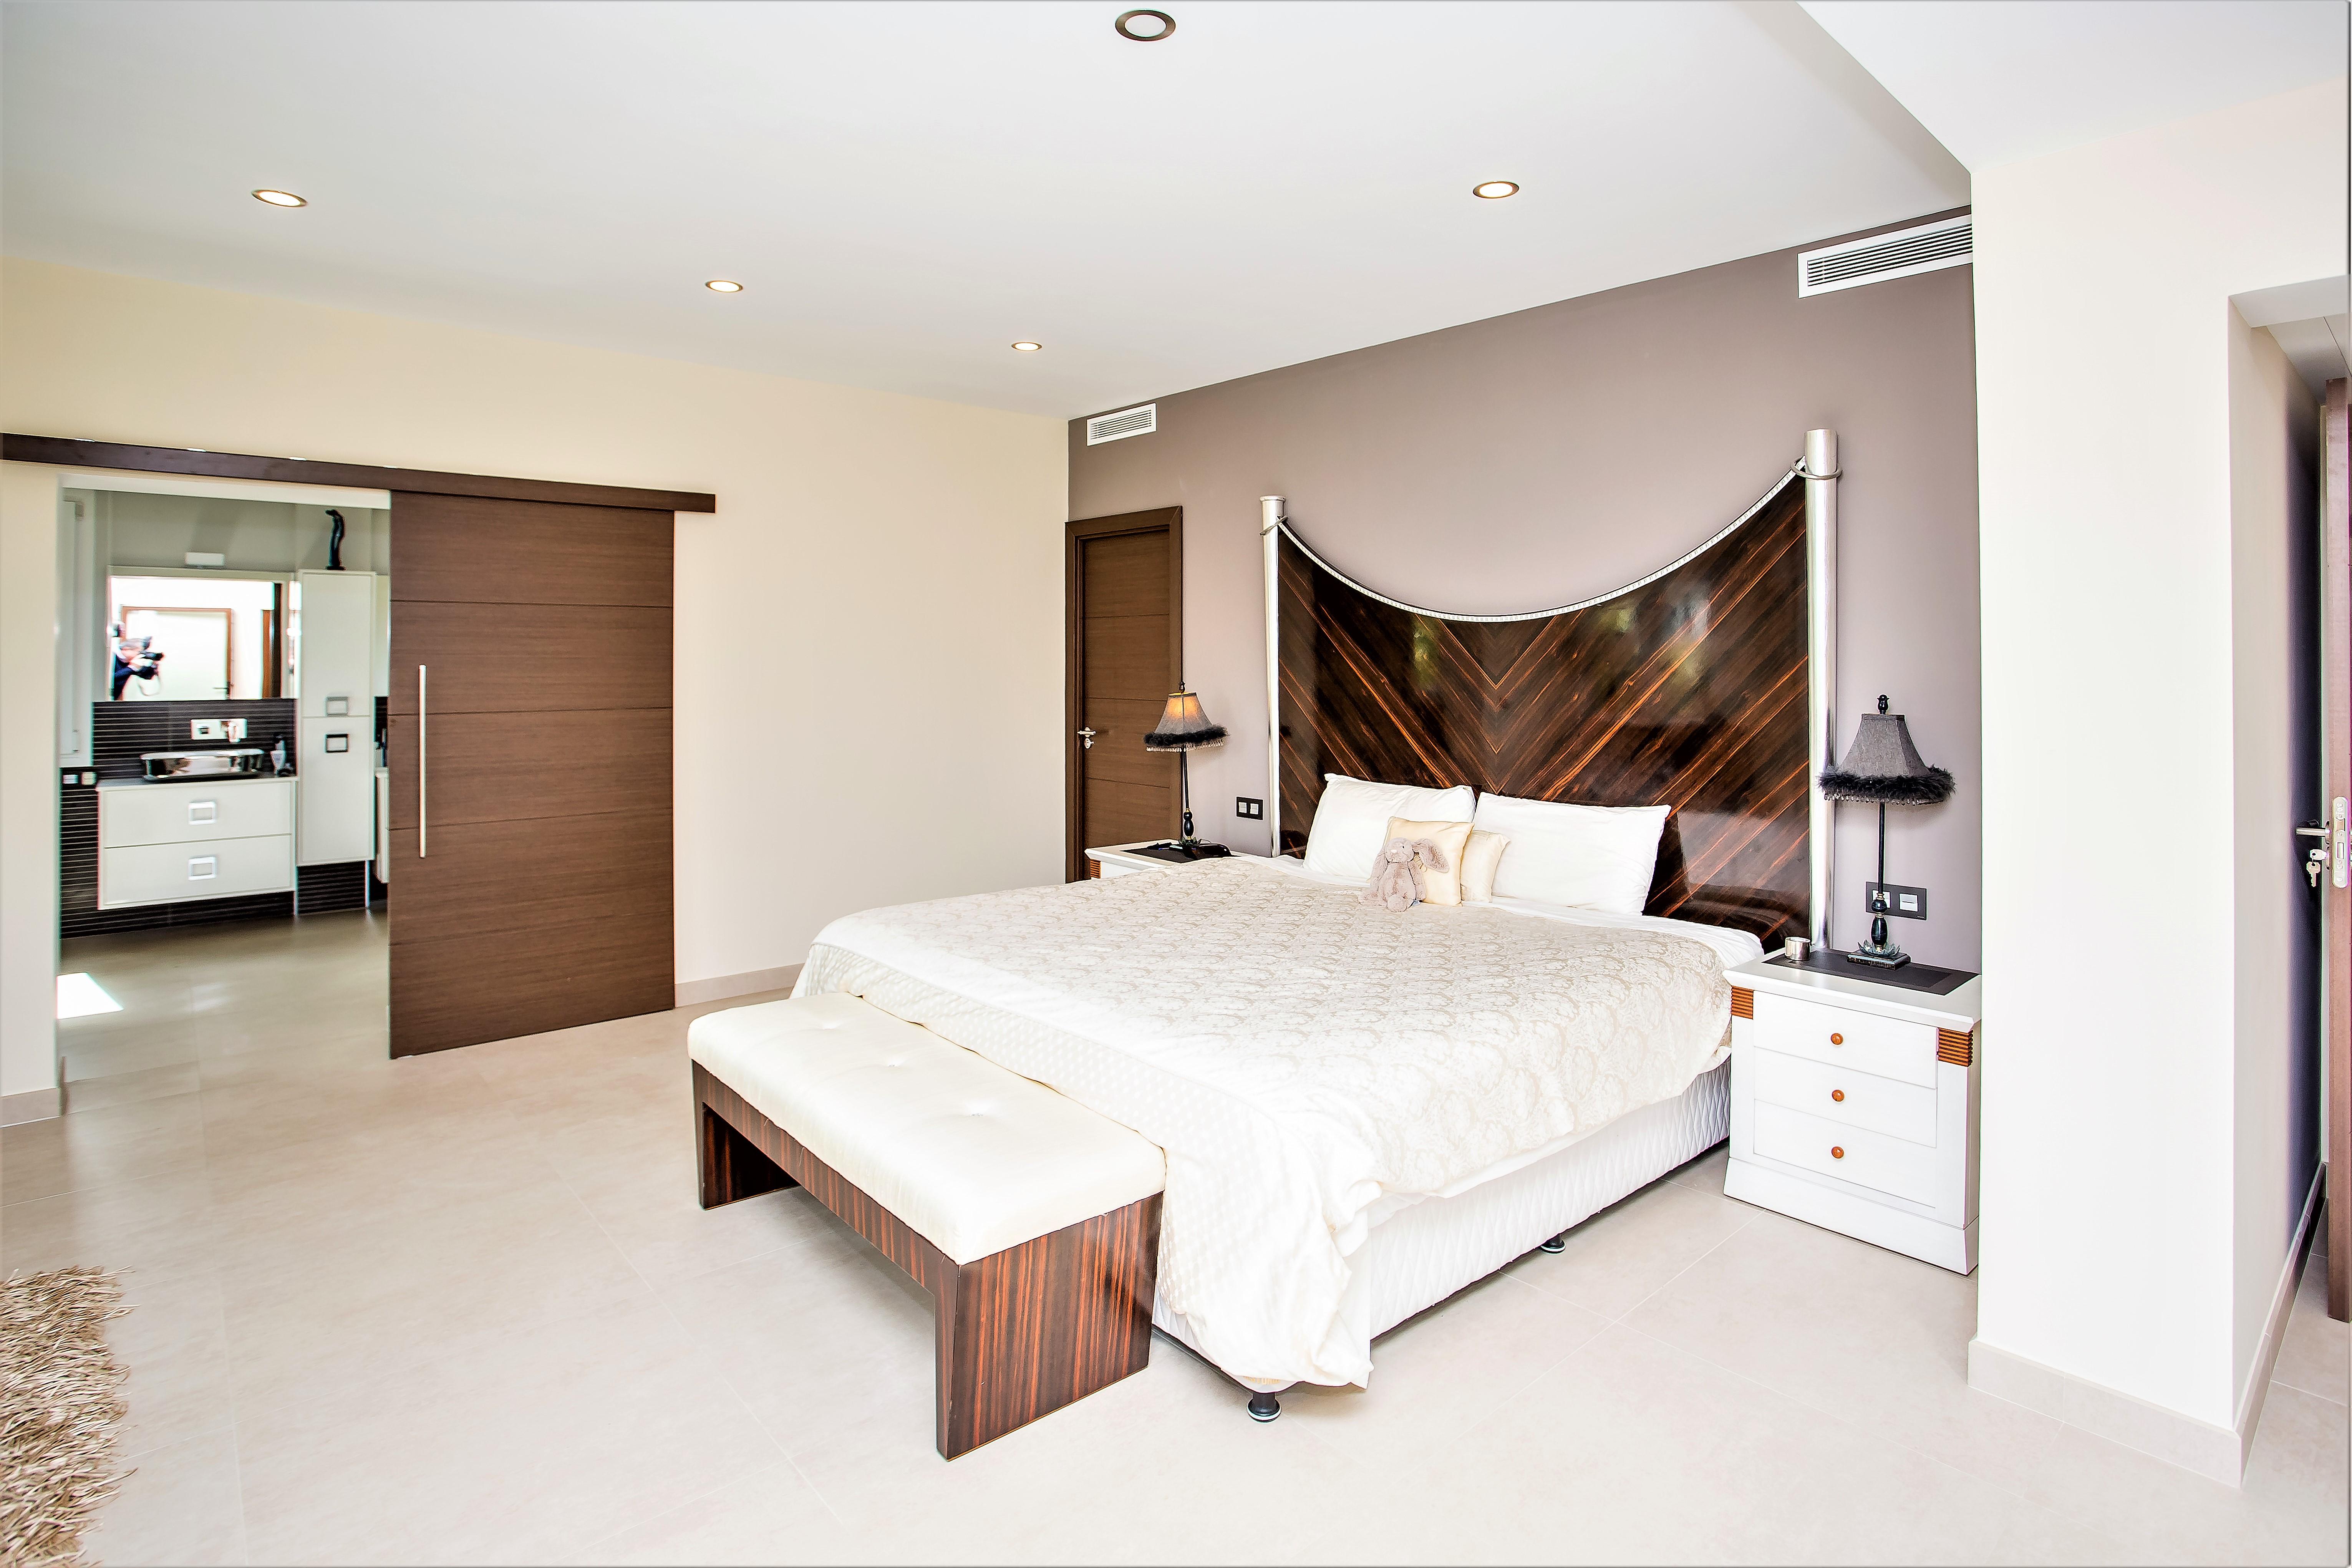 Apartment 8 Bedroom VILLA BY PUERTO BANUS   SEA 5 min                                photo 16713360